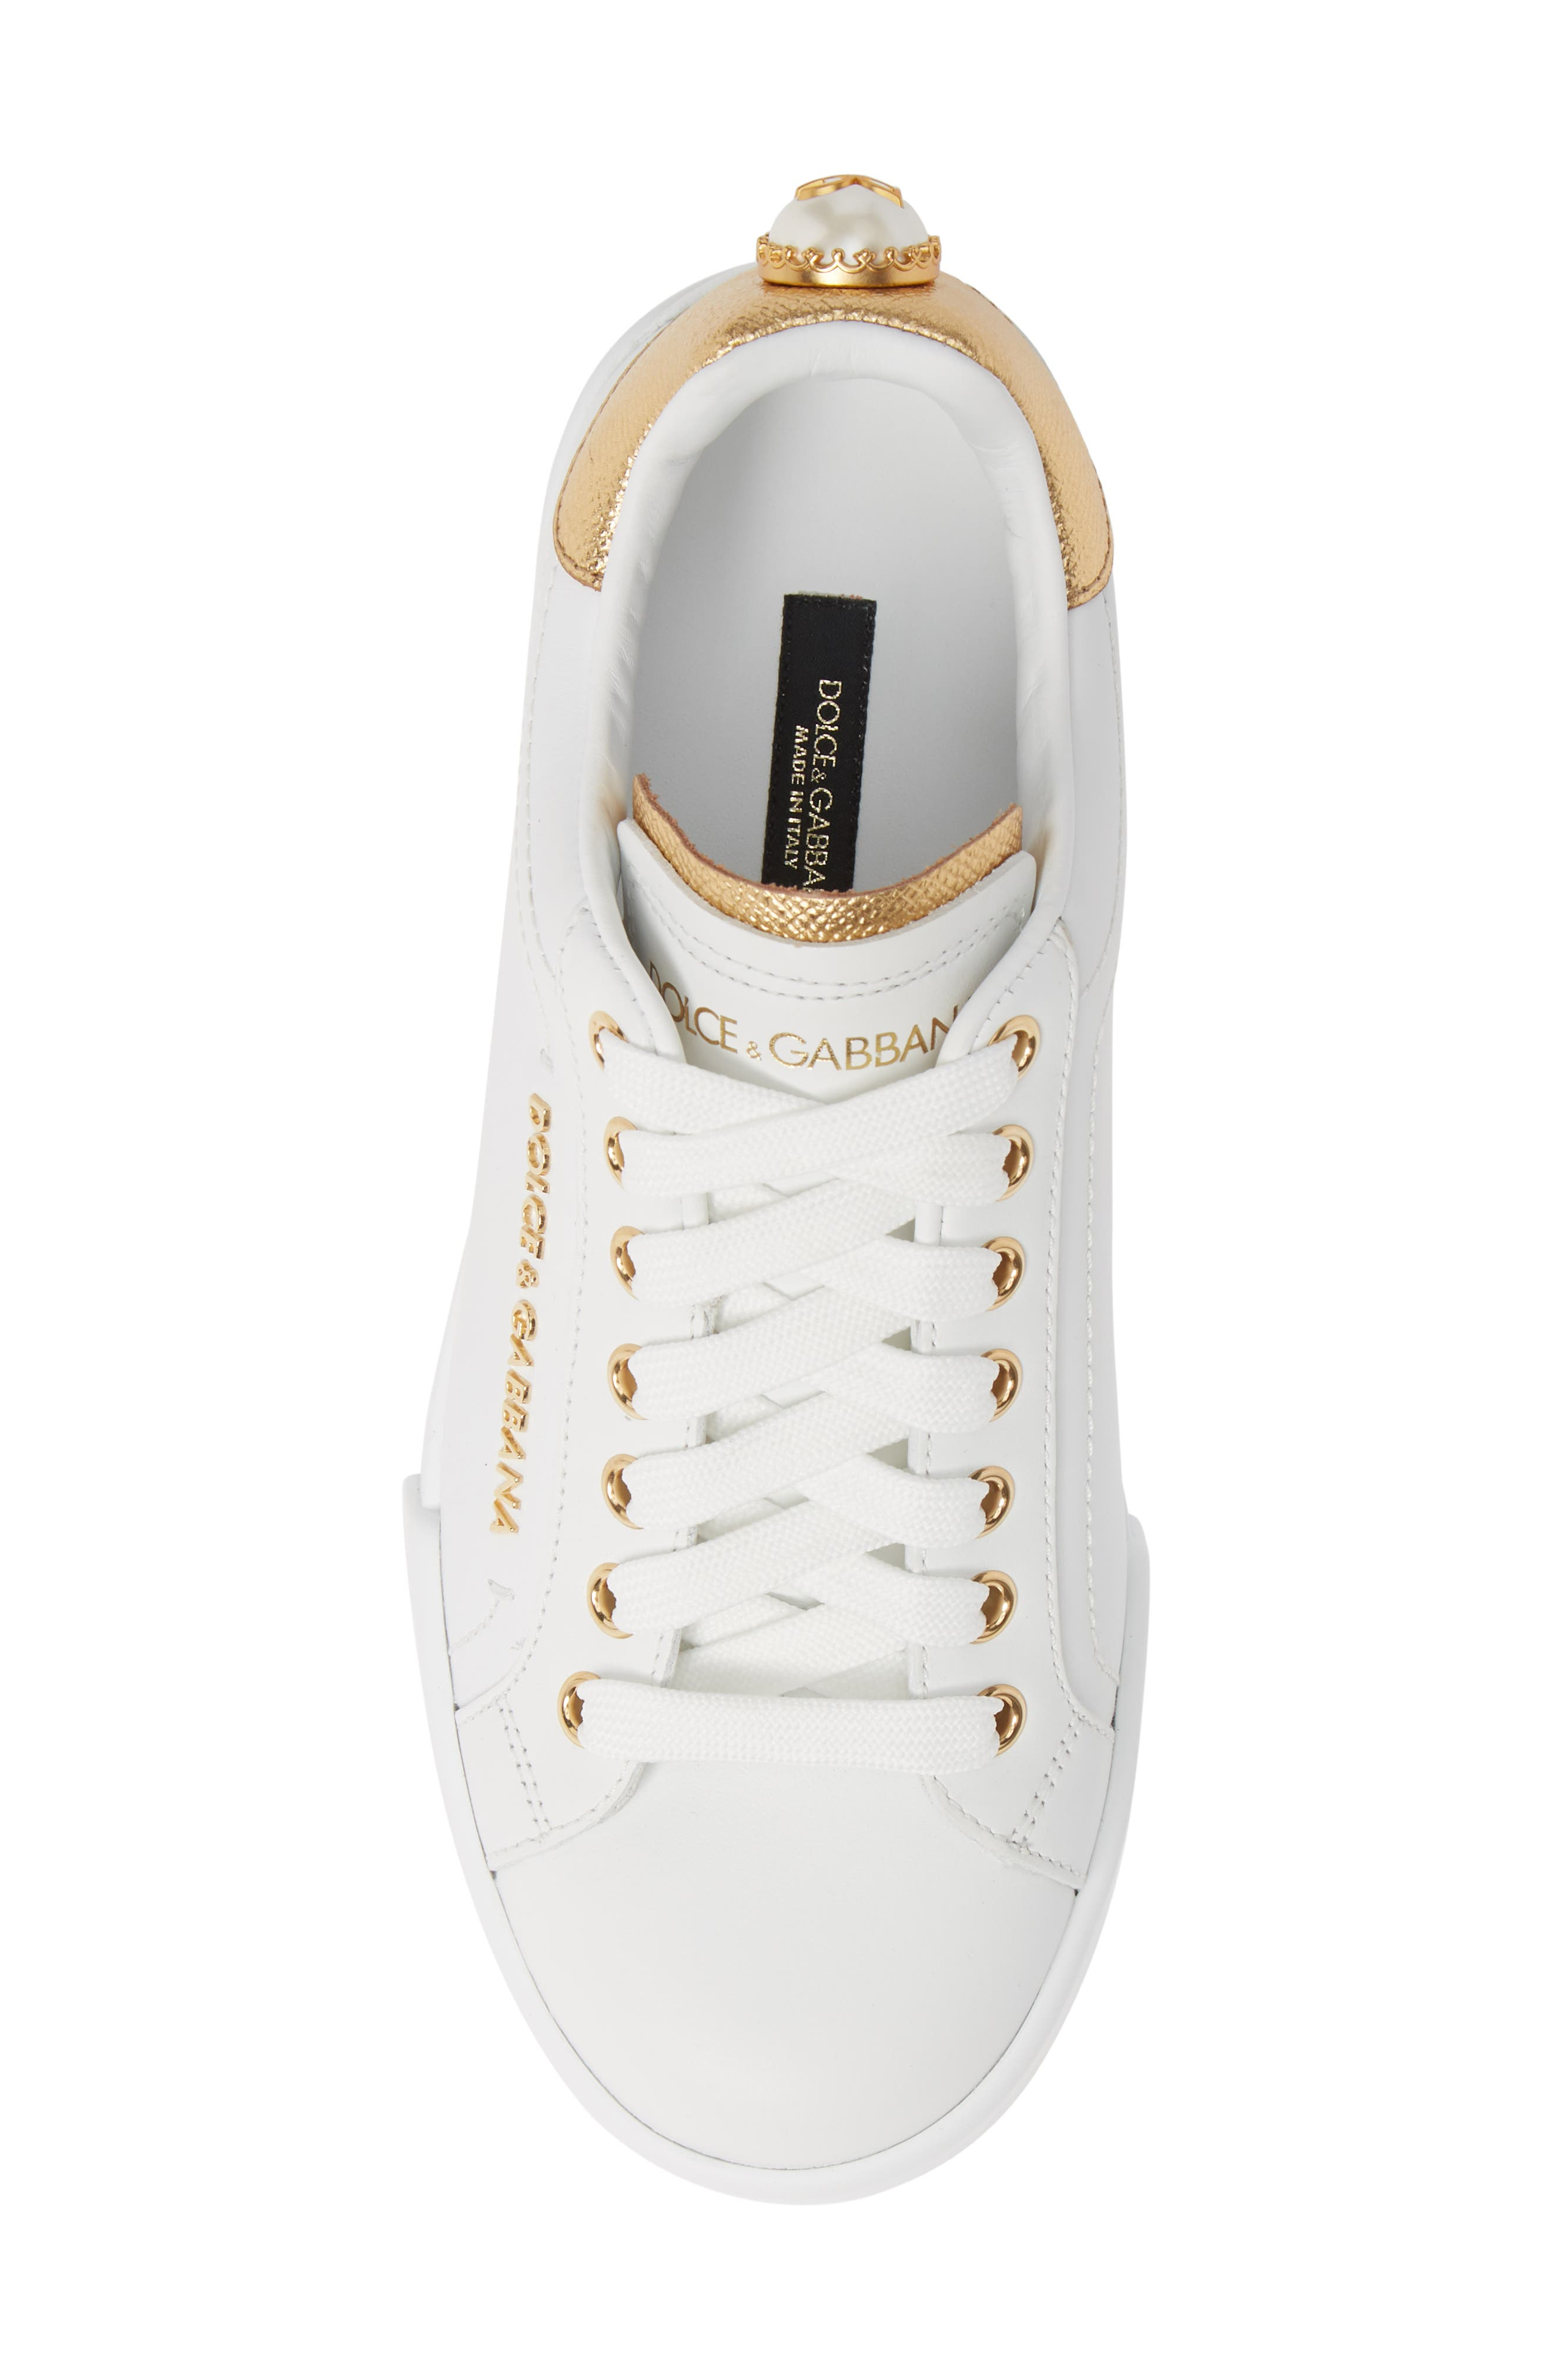 DOLCE&GABBANA, Portofino Embellished Sneaker, Alternate thumbnail 5, color, WHITE/ GOLD